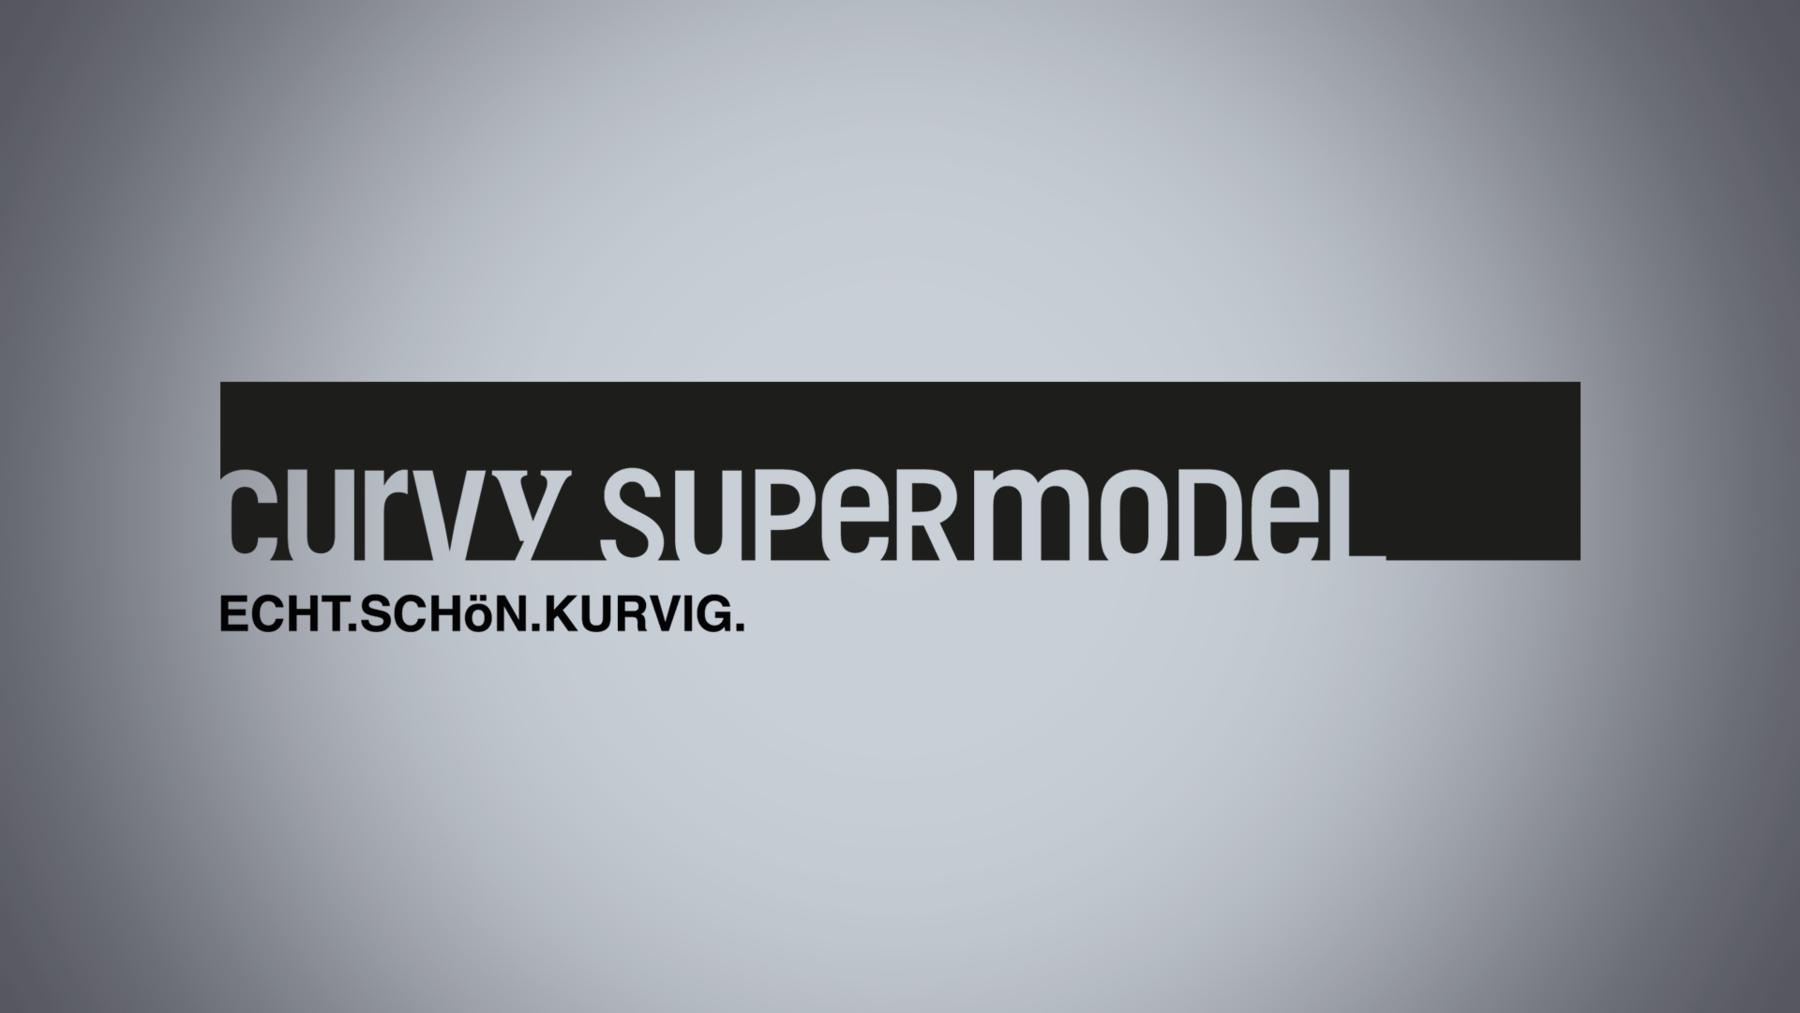 Curvy Supermodel